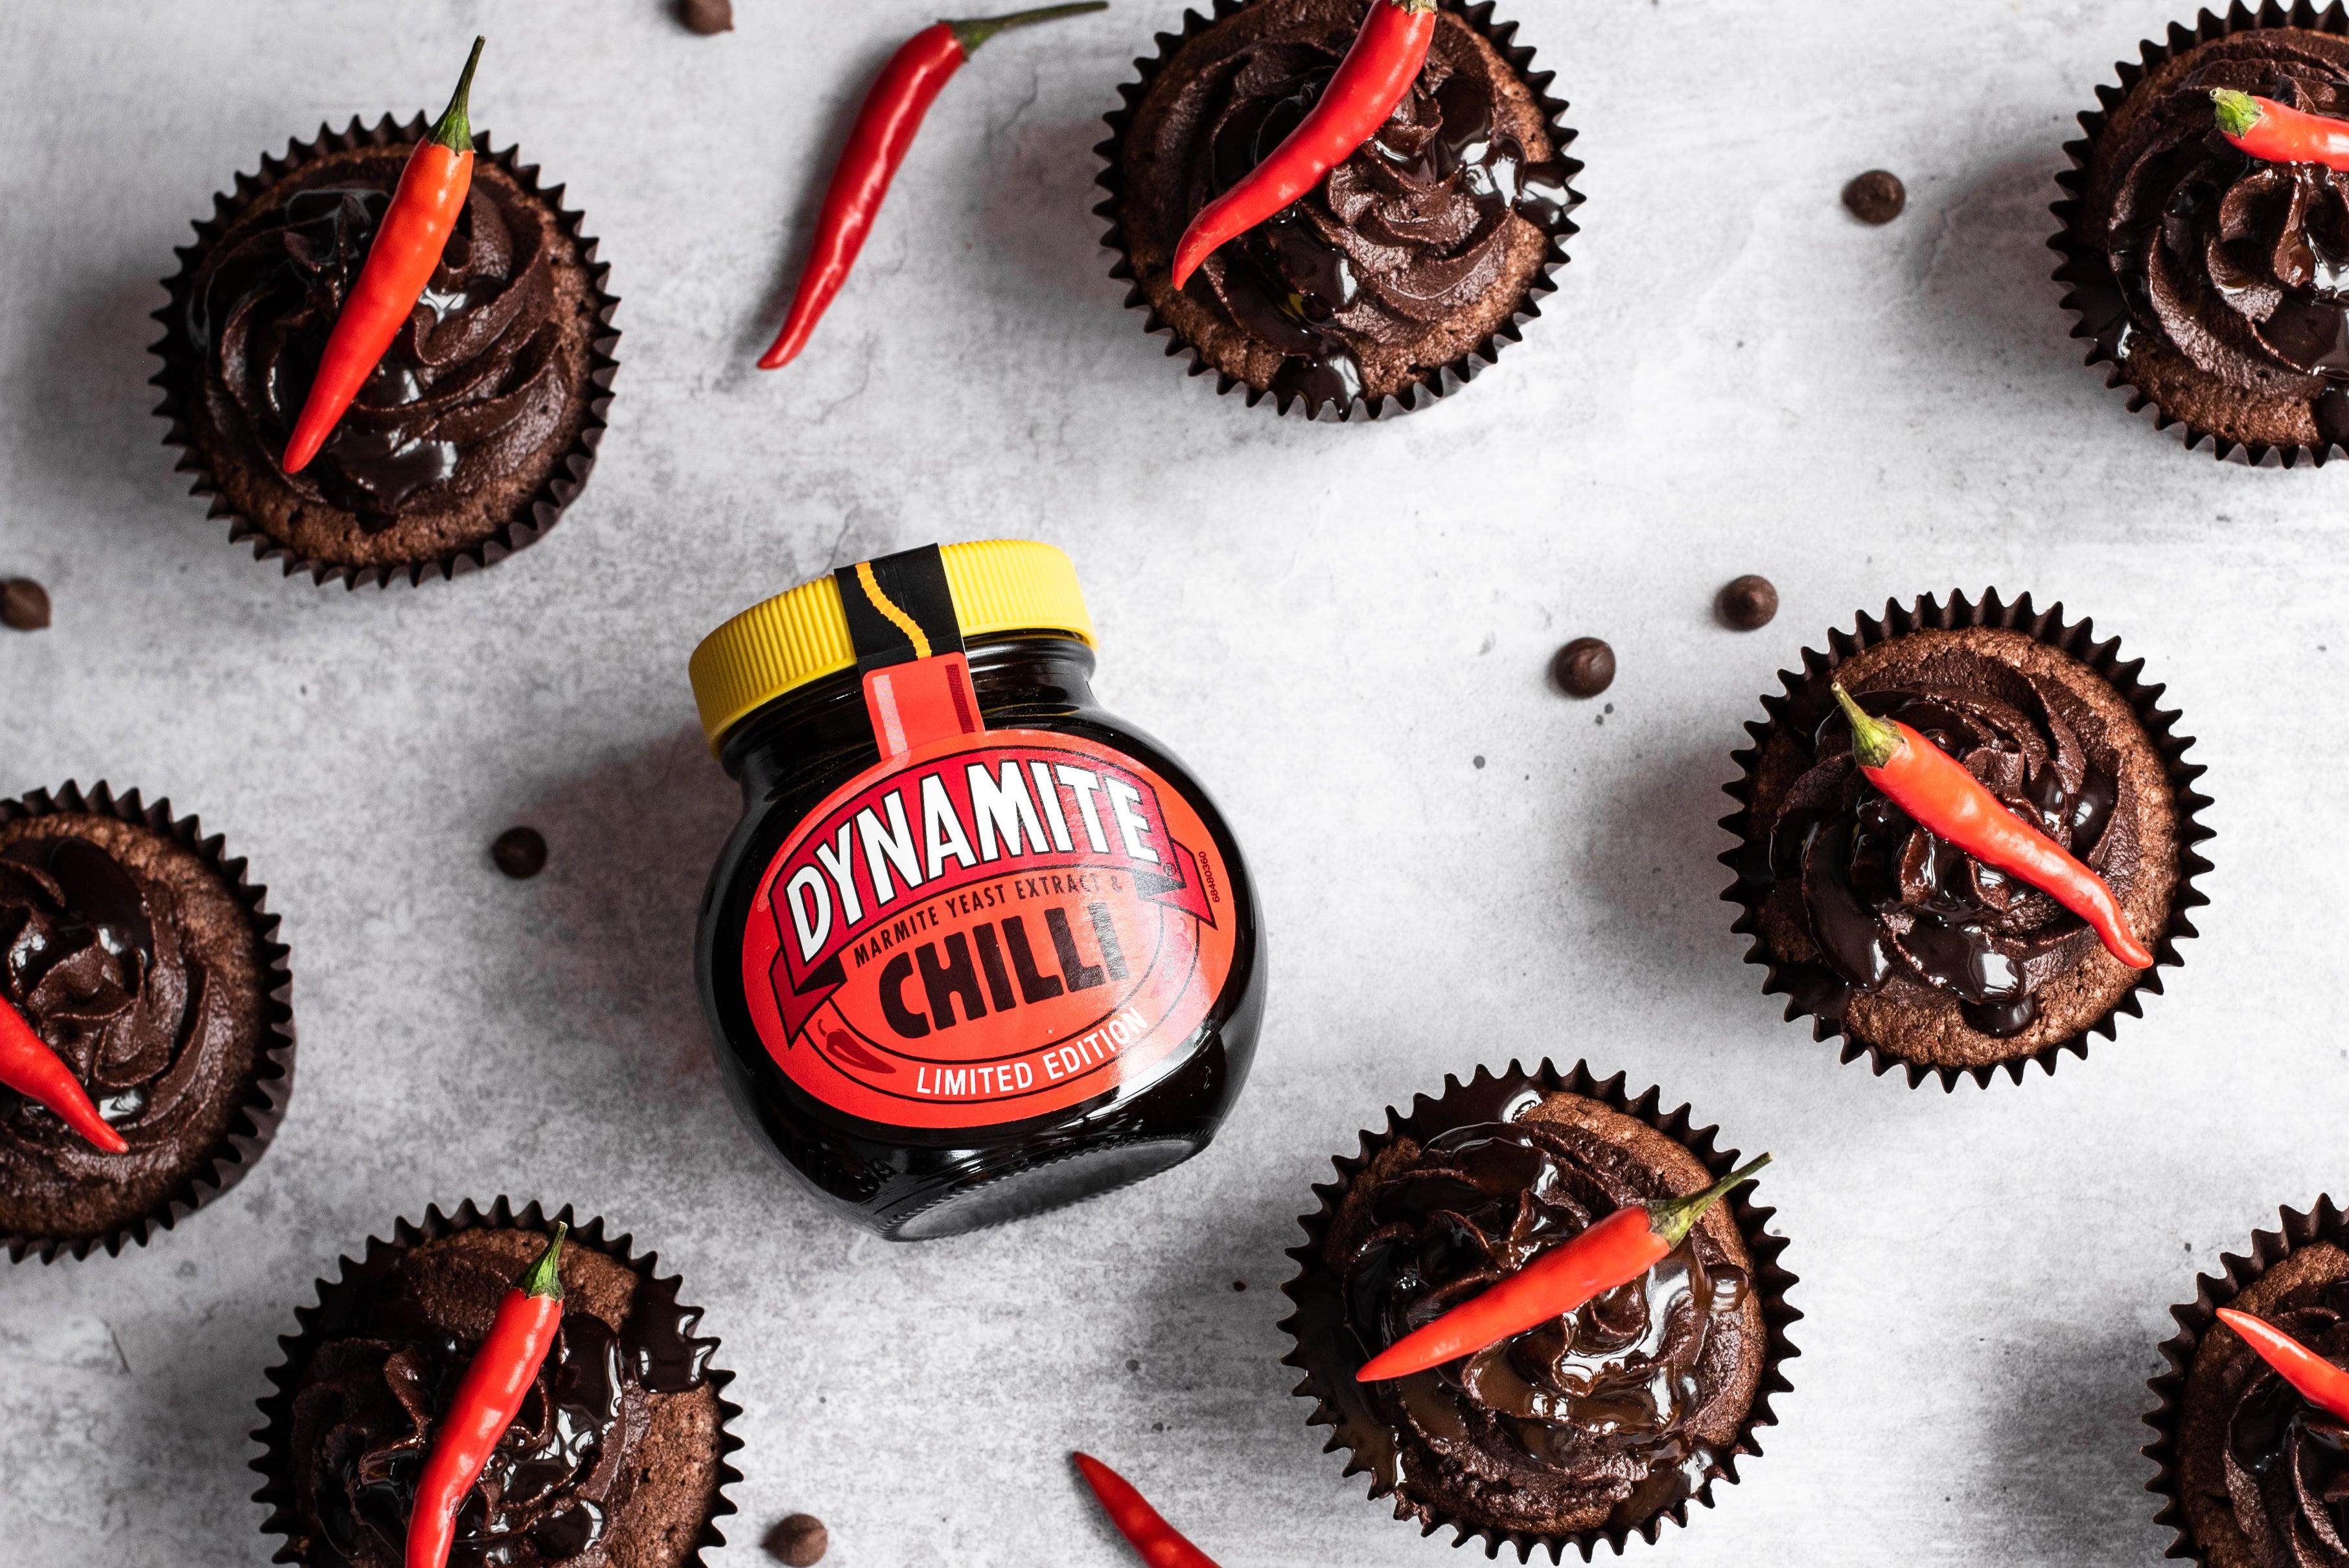 birds-eye view of chocolate cupcakes next to dynamite chilli jar